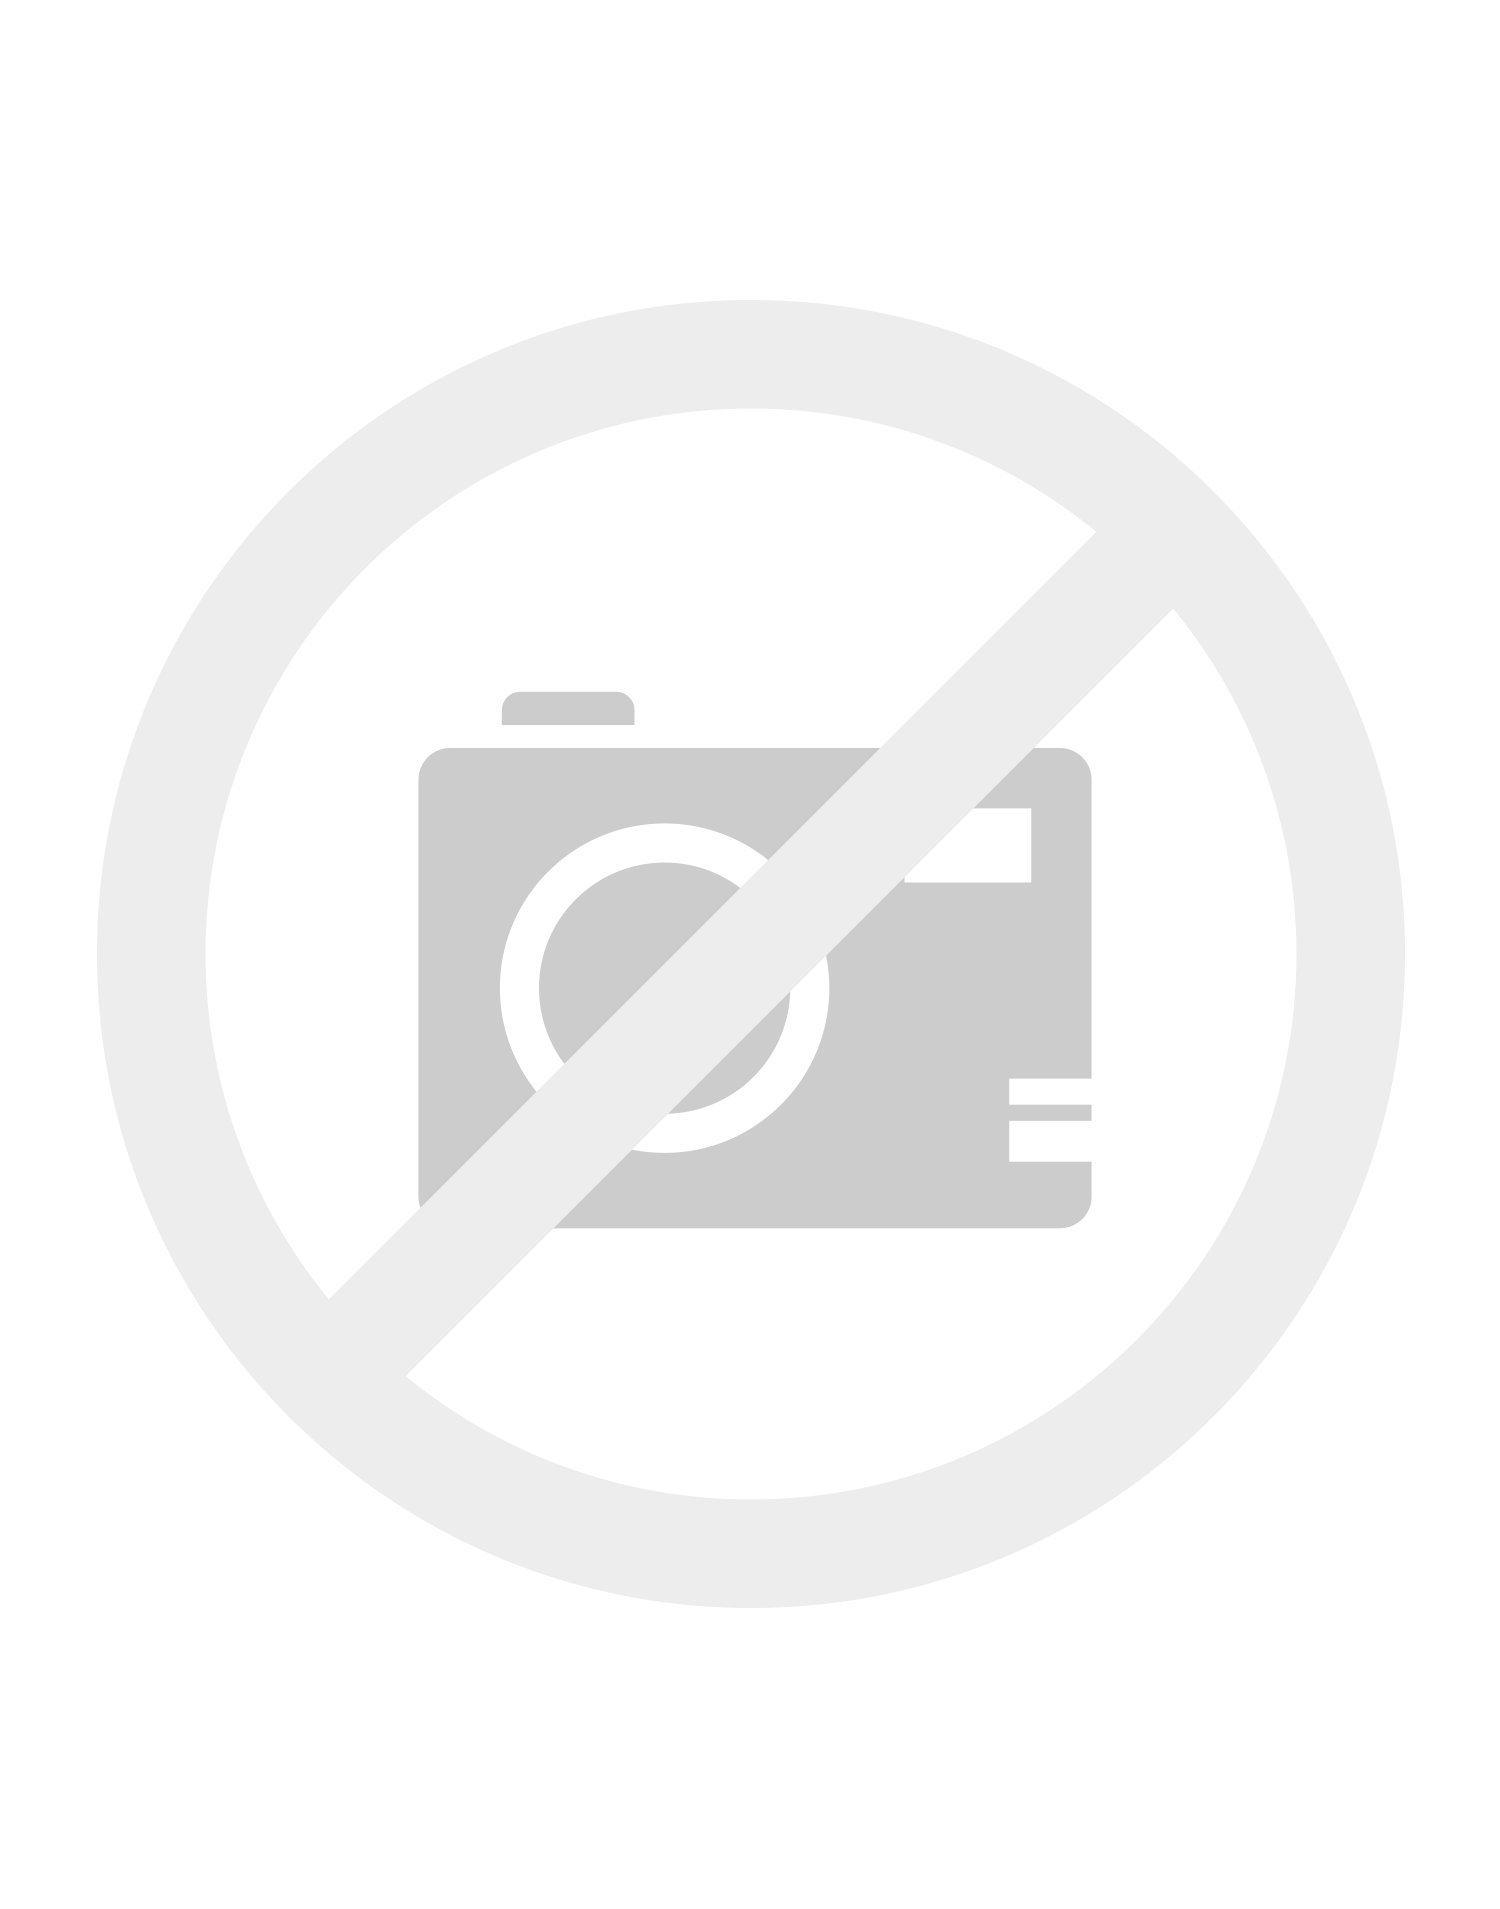 TøjSkoKjoleramp; Undertøj– Undertøj– TøjSkoKjoleramp; Online Mode Online Mode EHYWDI29